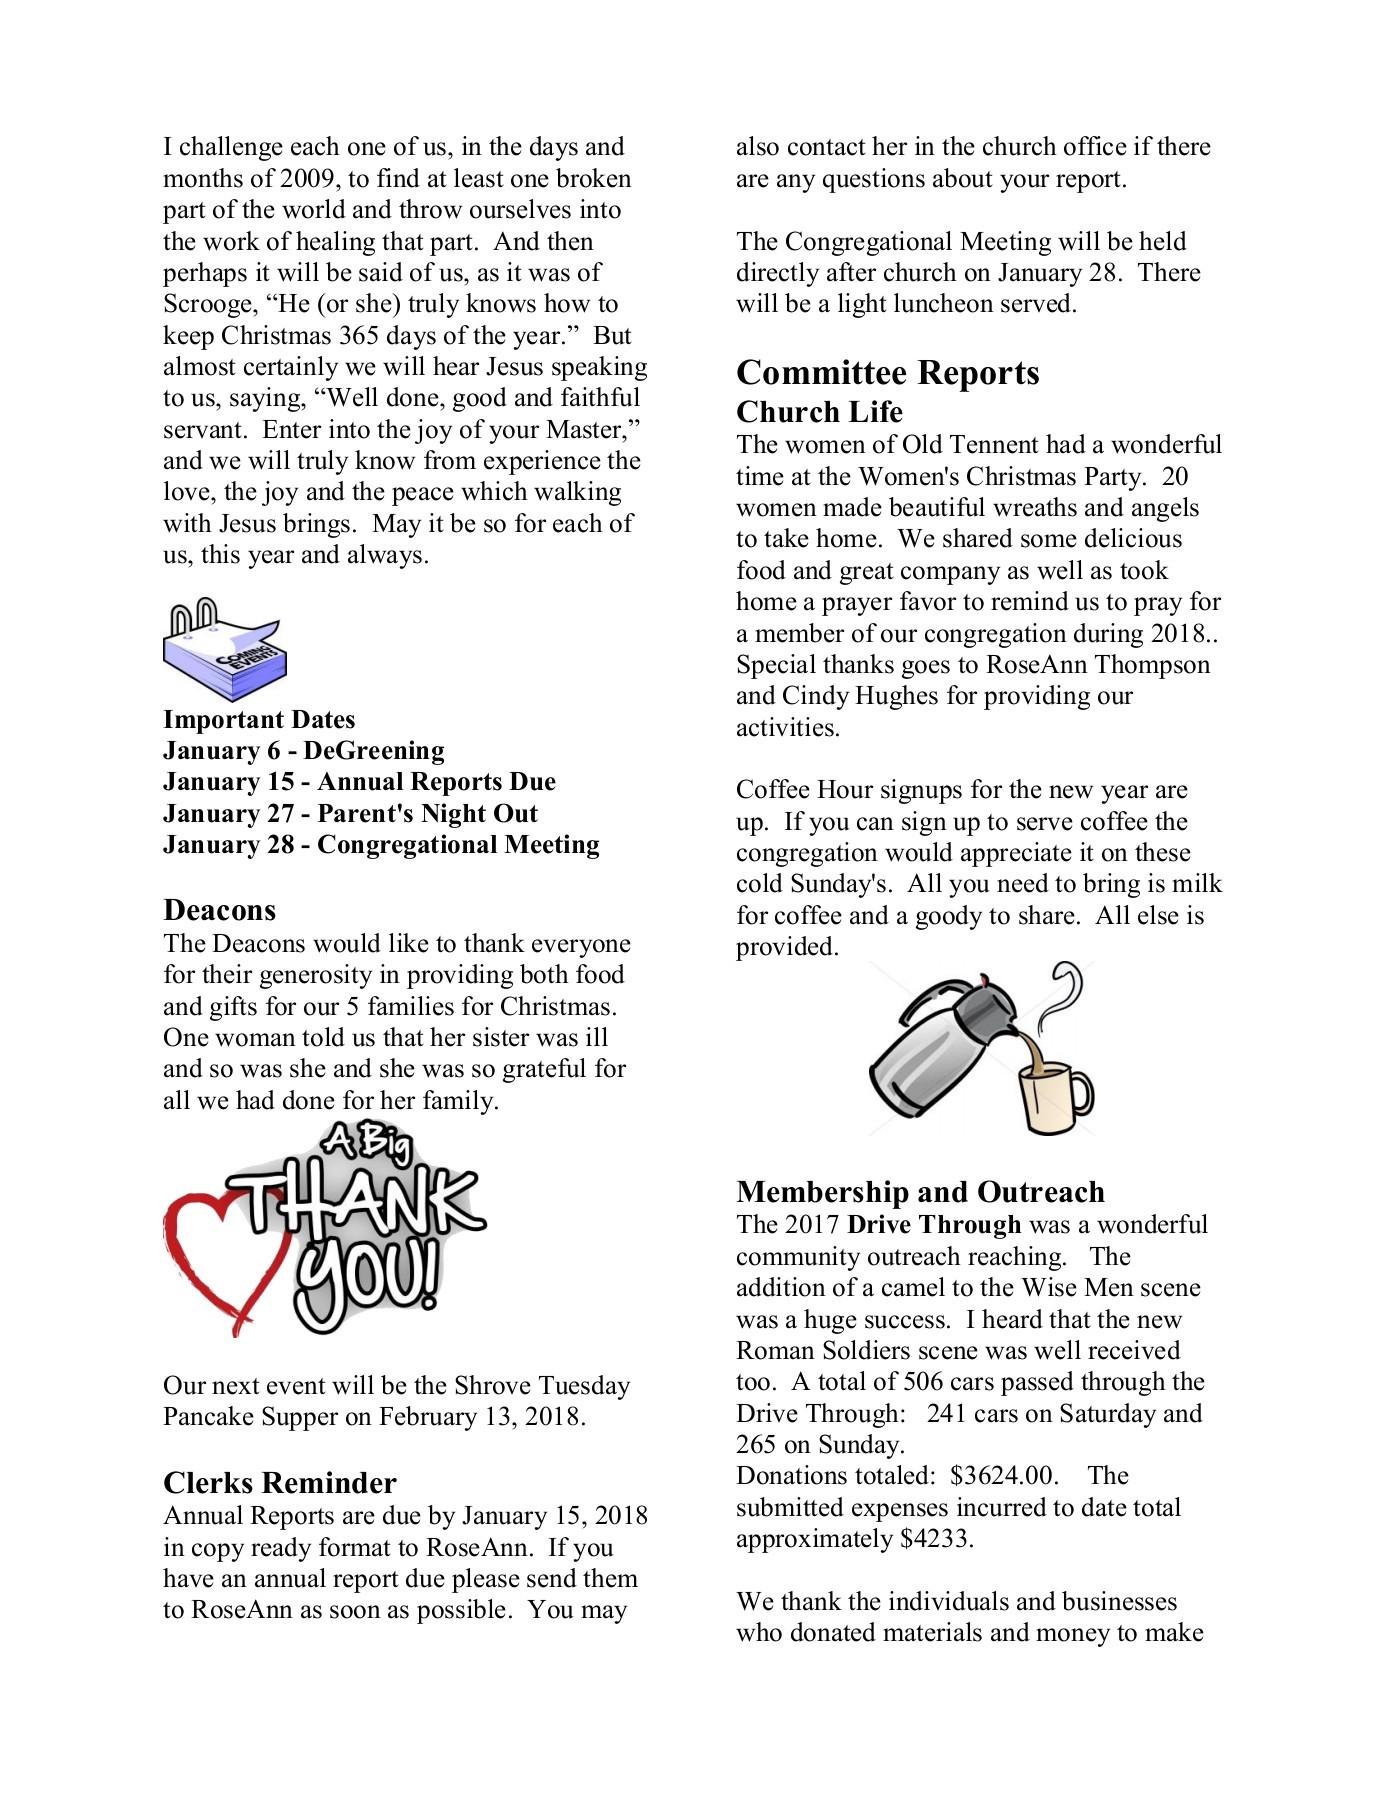 The Meetinghouse News January 2018 | PubHTML5